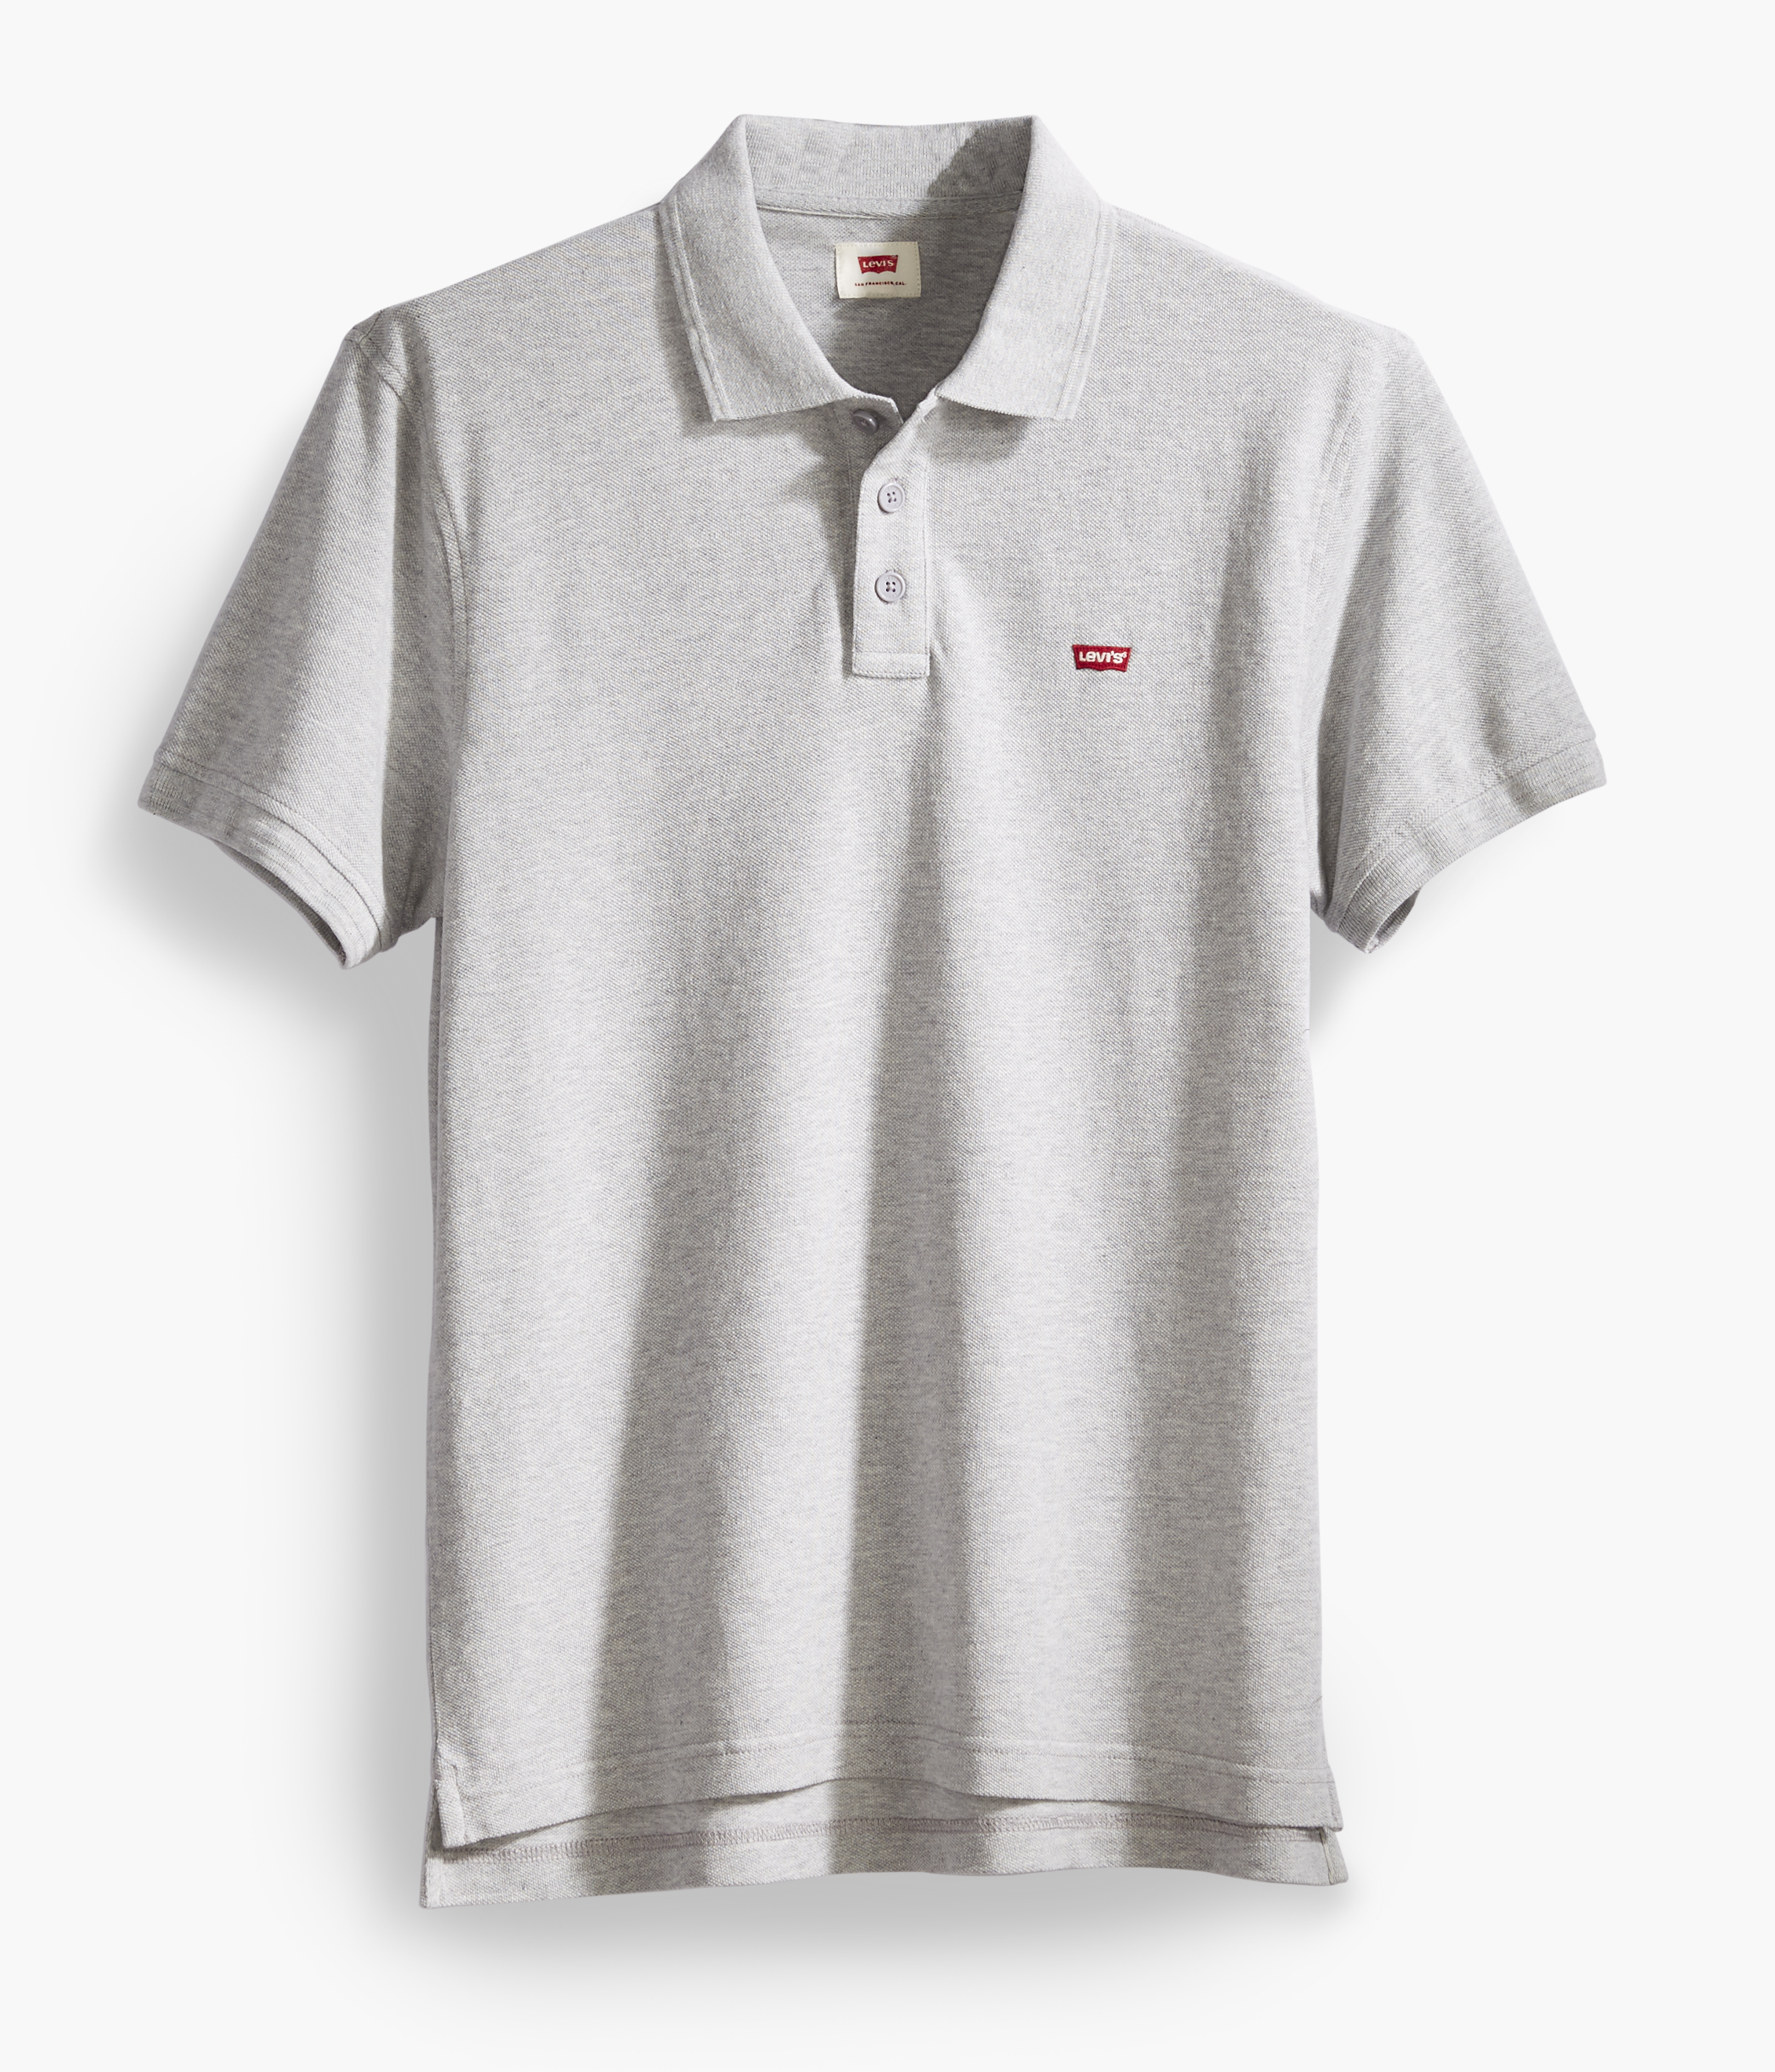 LEVIS Shirt Kurzarm Poloshirt 22401-0002 hellgrau W18-LVPS1